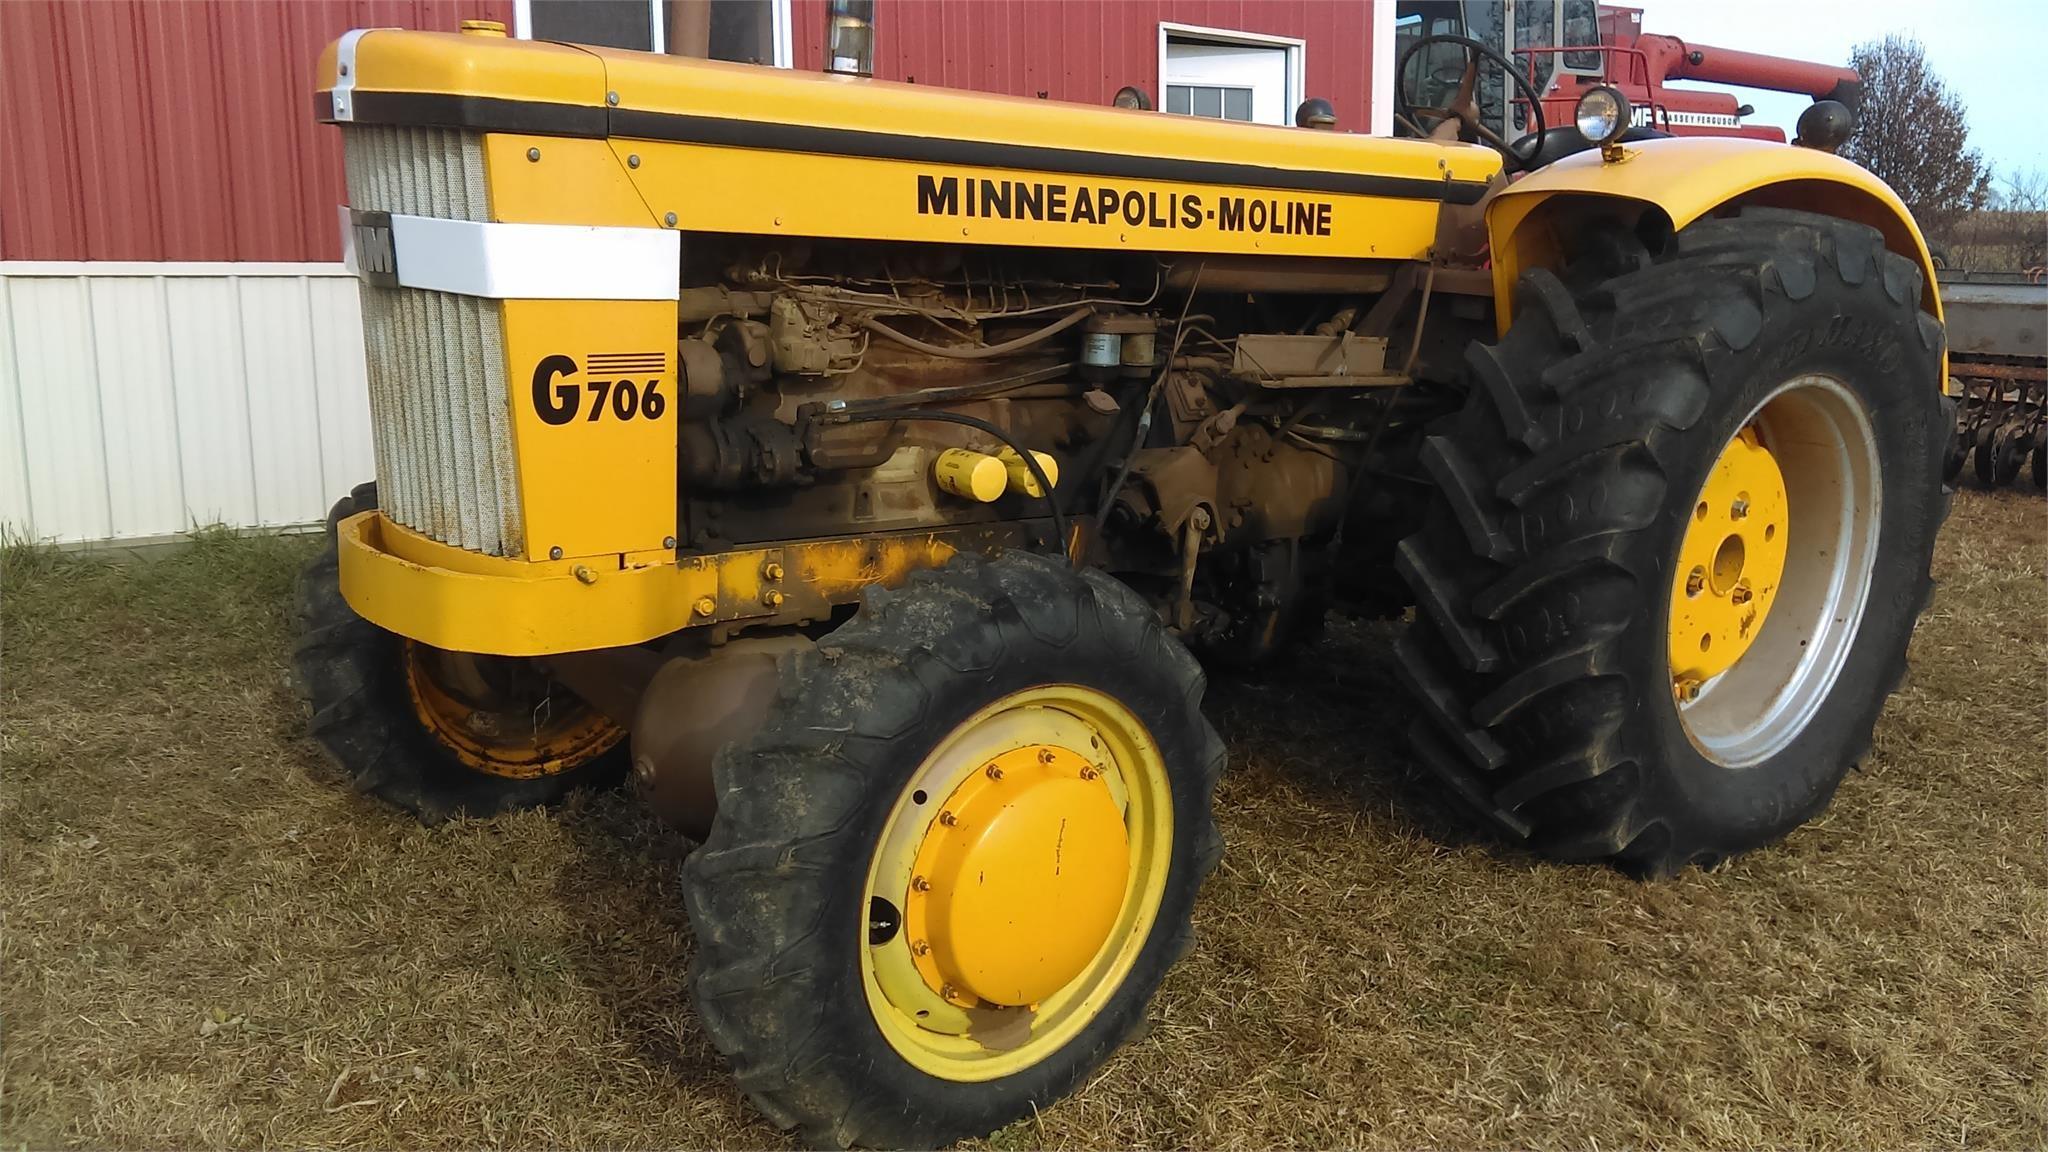 1965 Minneapolis-Moline G706 Tractor